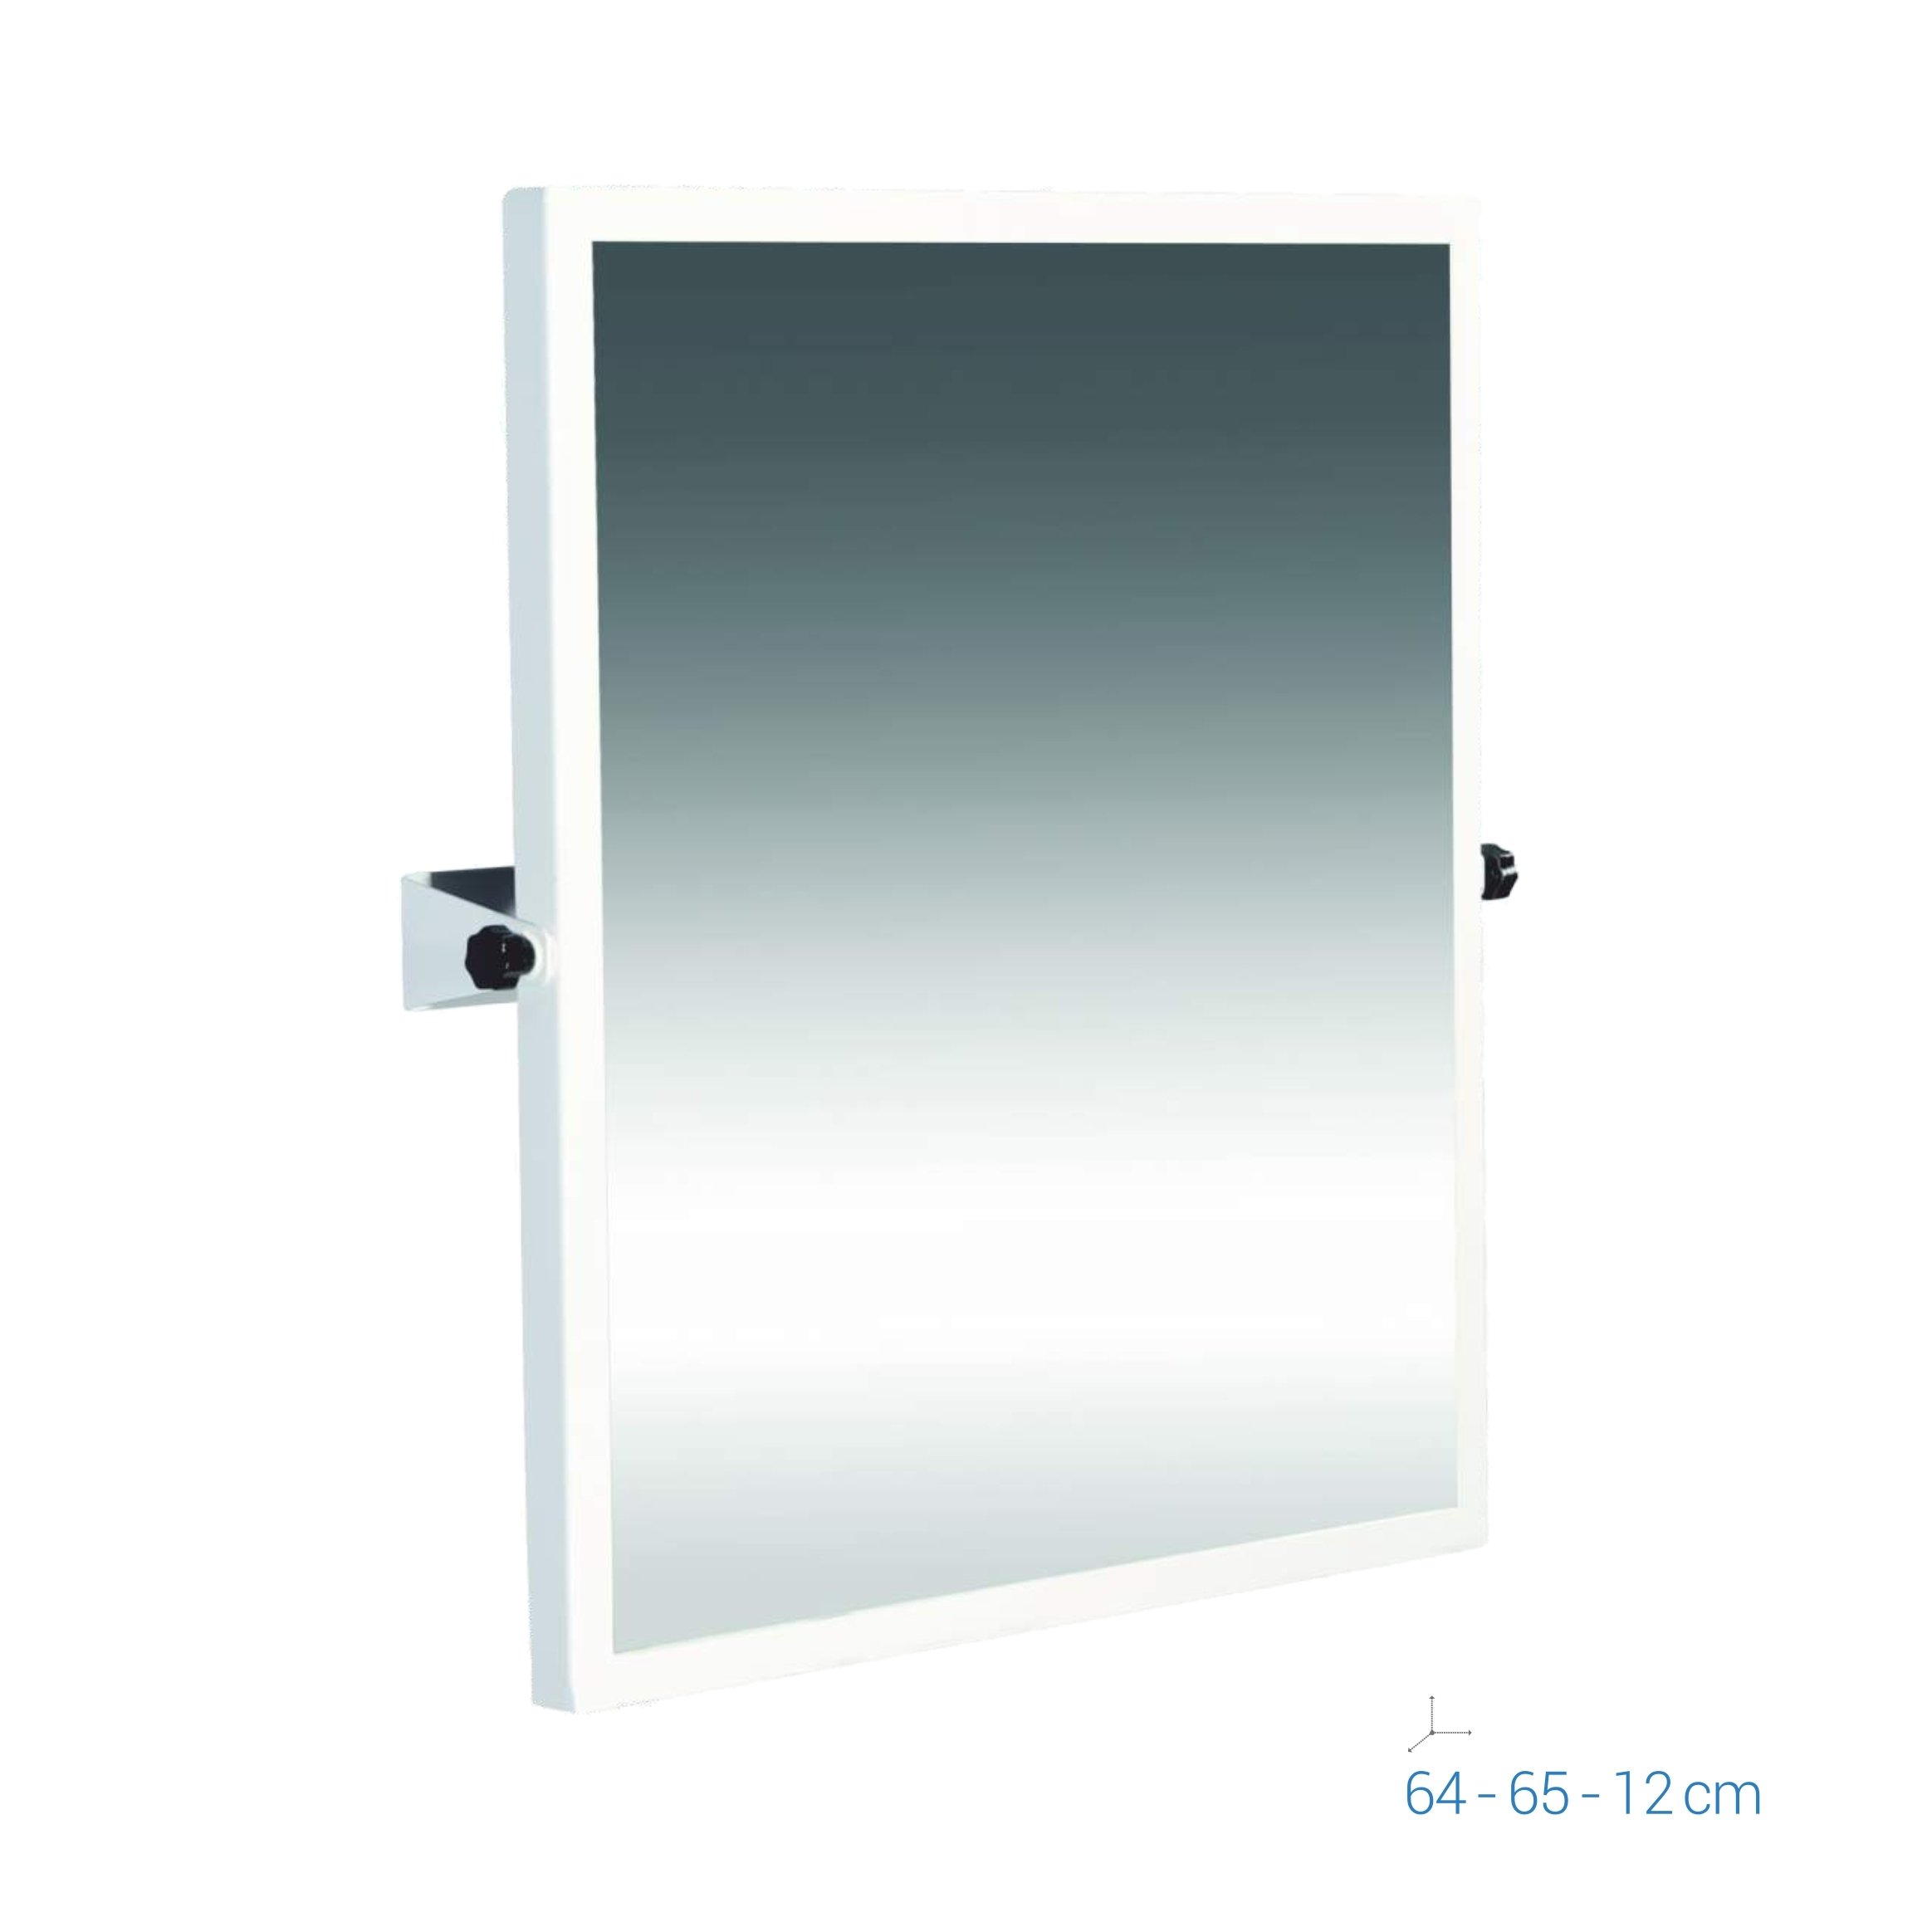 Oglinda pivotanta pentru persoane cu dizabilitati Metaform Comfort Line 101C21004